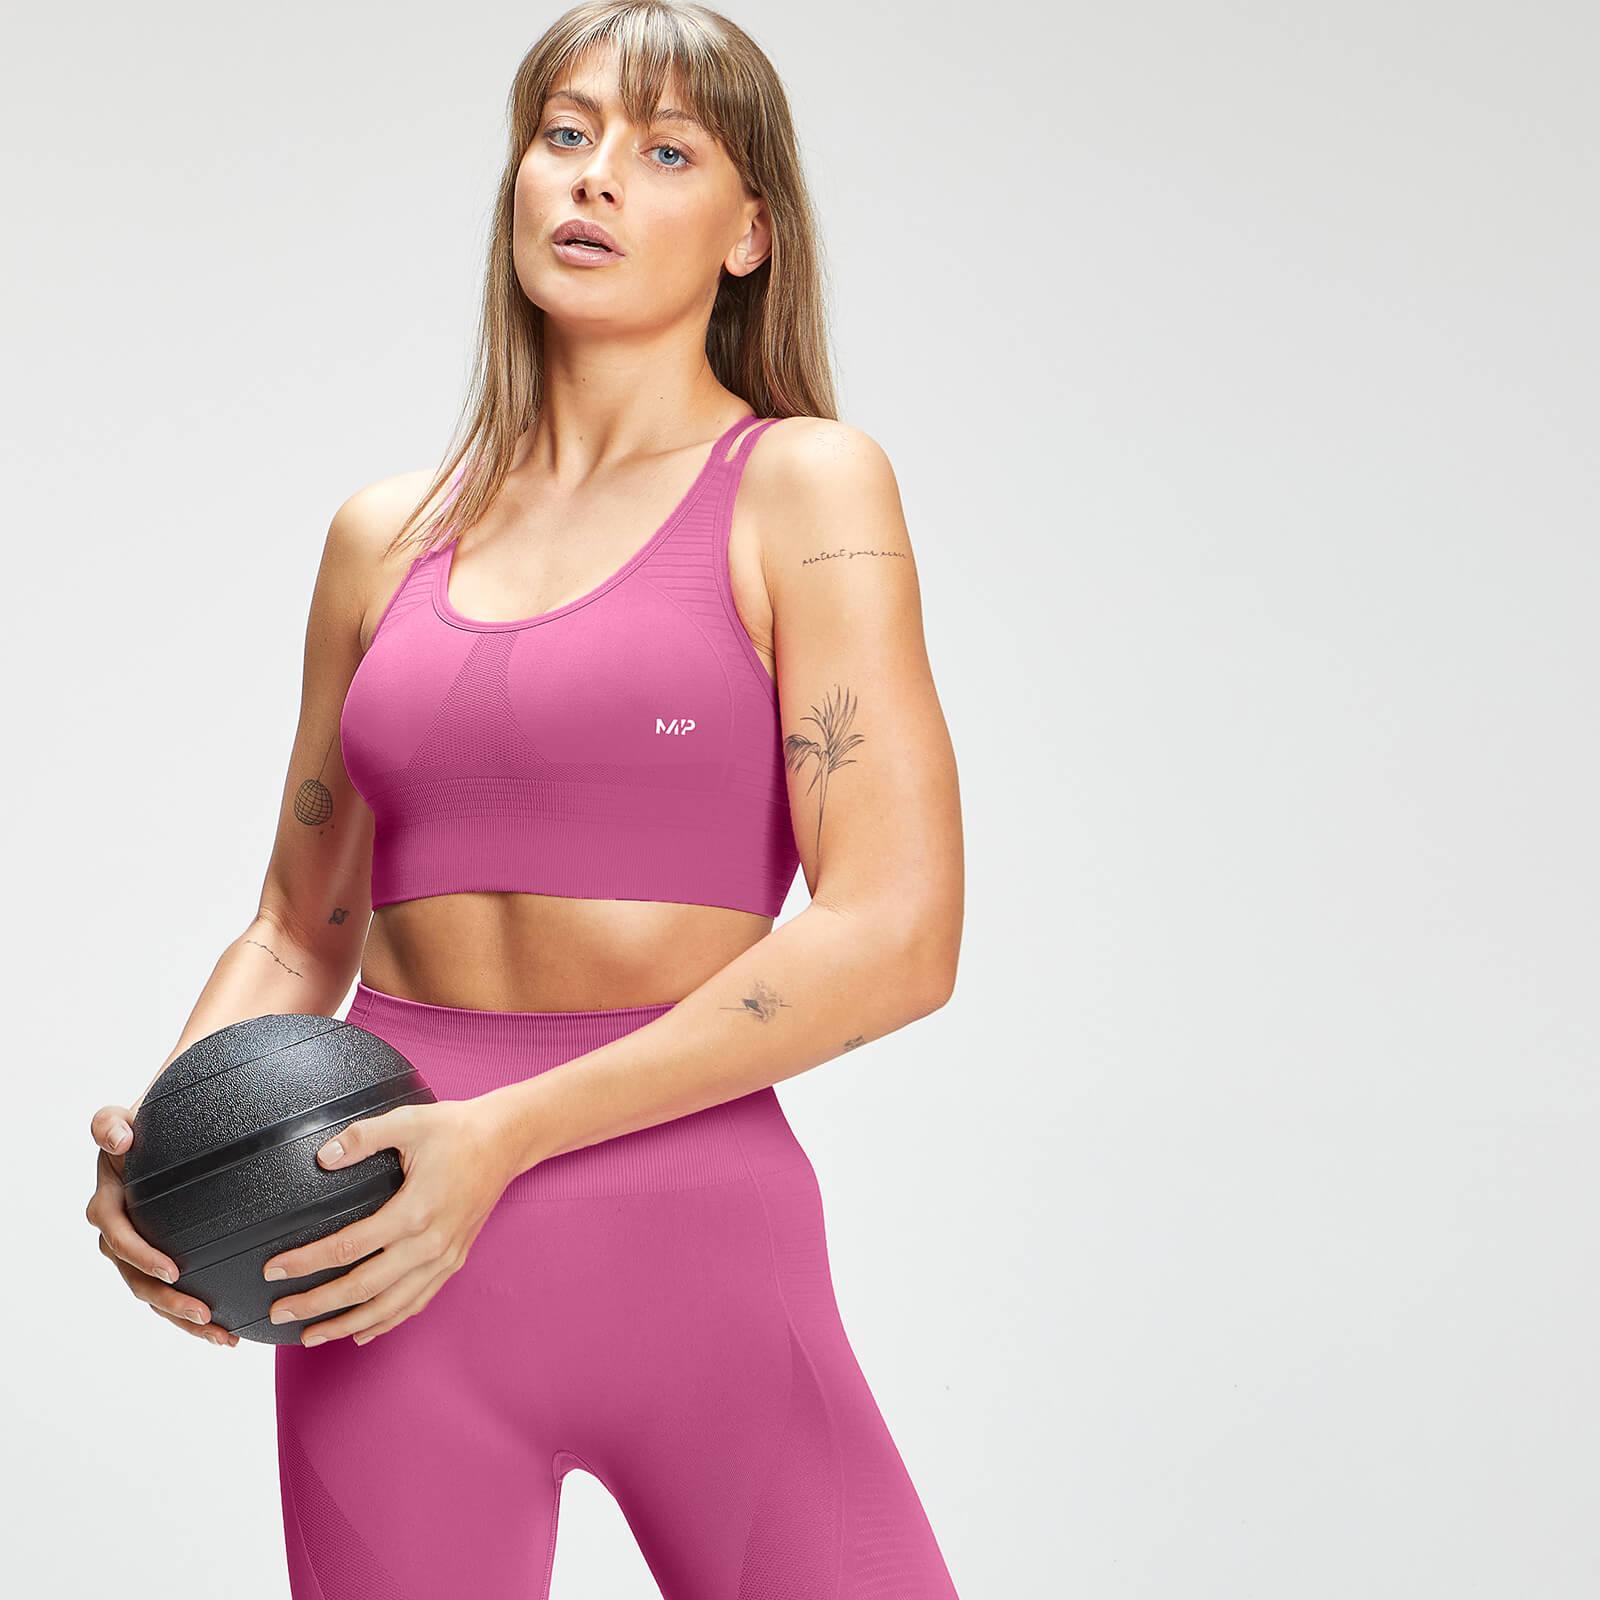 Купить MP Women's Tempo Seamless Sports Bra - Pink - XXS, Myprotein International